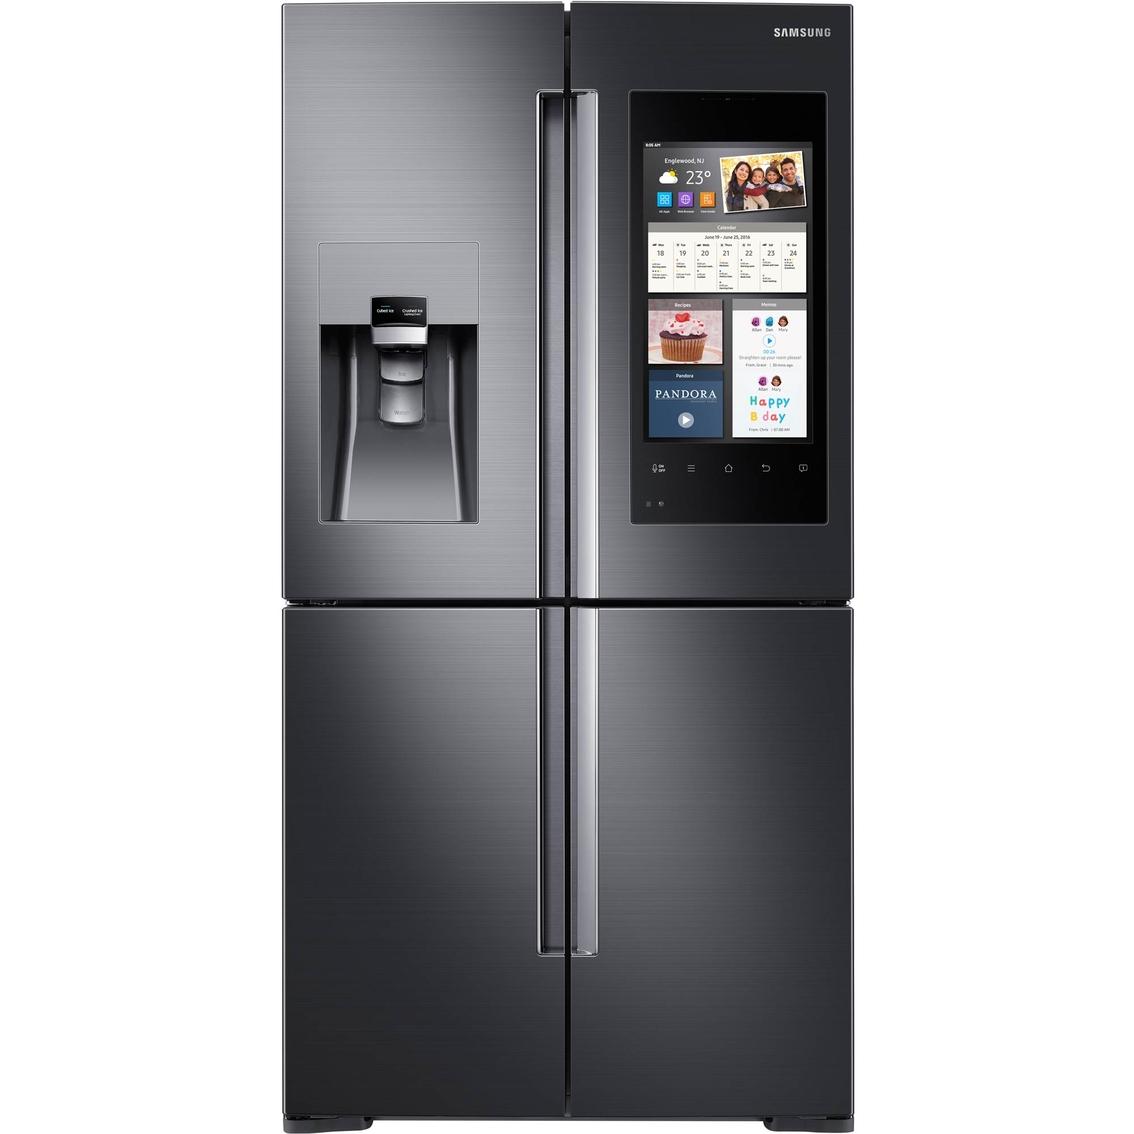 Samsung 28 Cu Ft  4 Door Flex Refrigerator With Family Hub